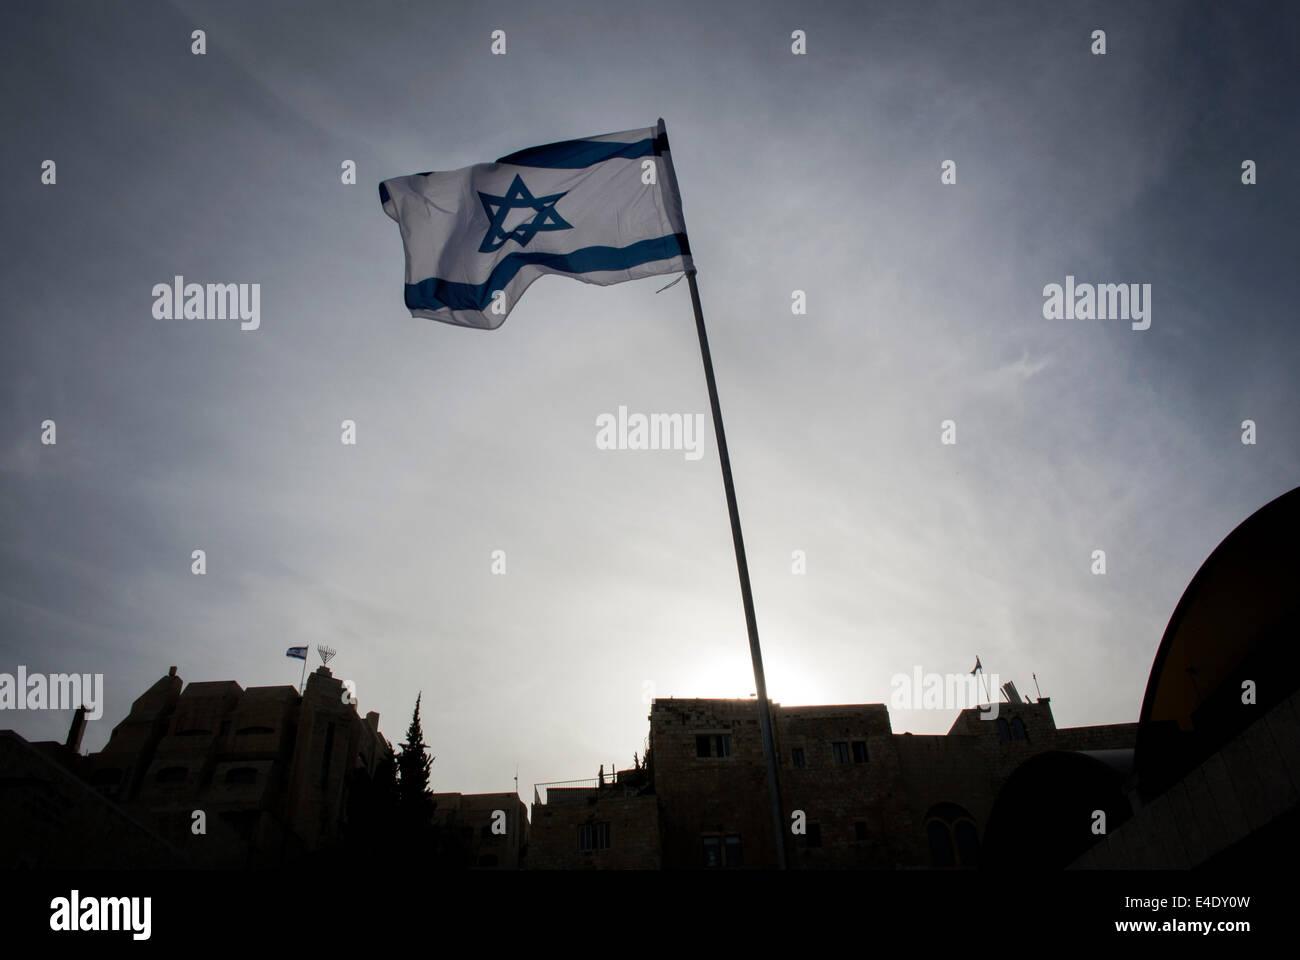 Israeli Flag flying near the Entrance to the Wailing Wall, Old City, Jerusalem, Palestine. - Stock Image